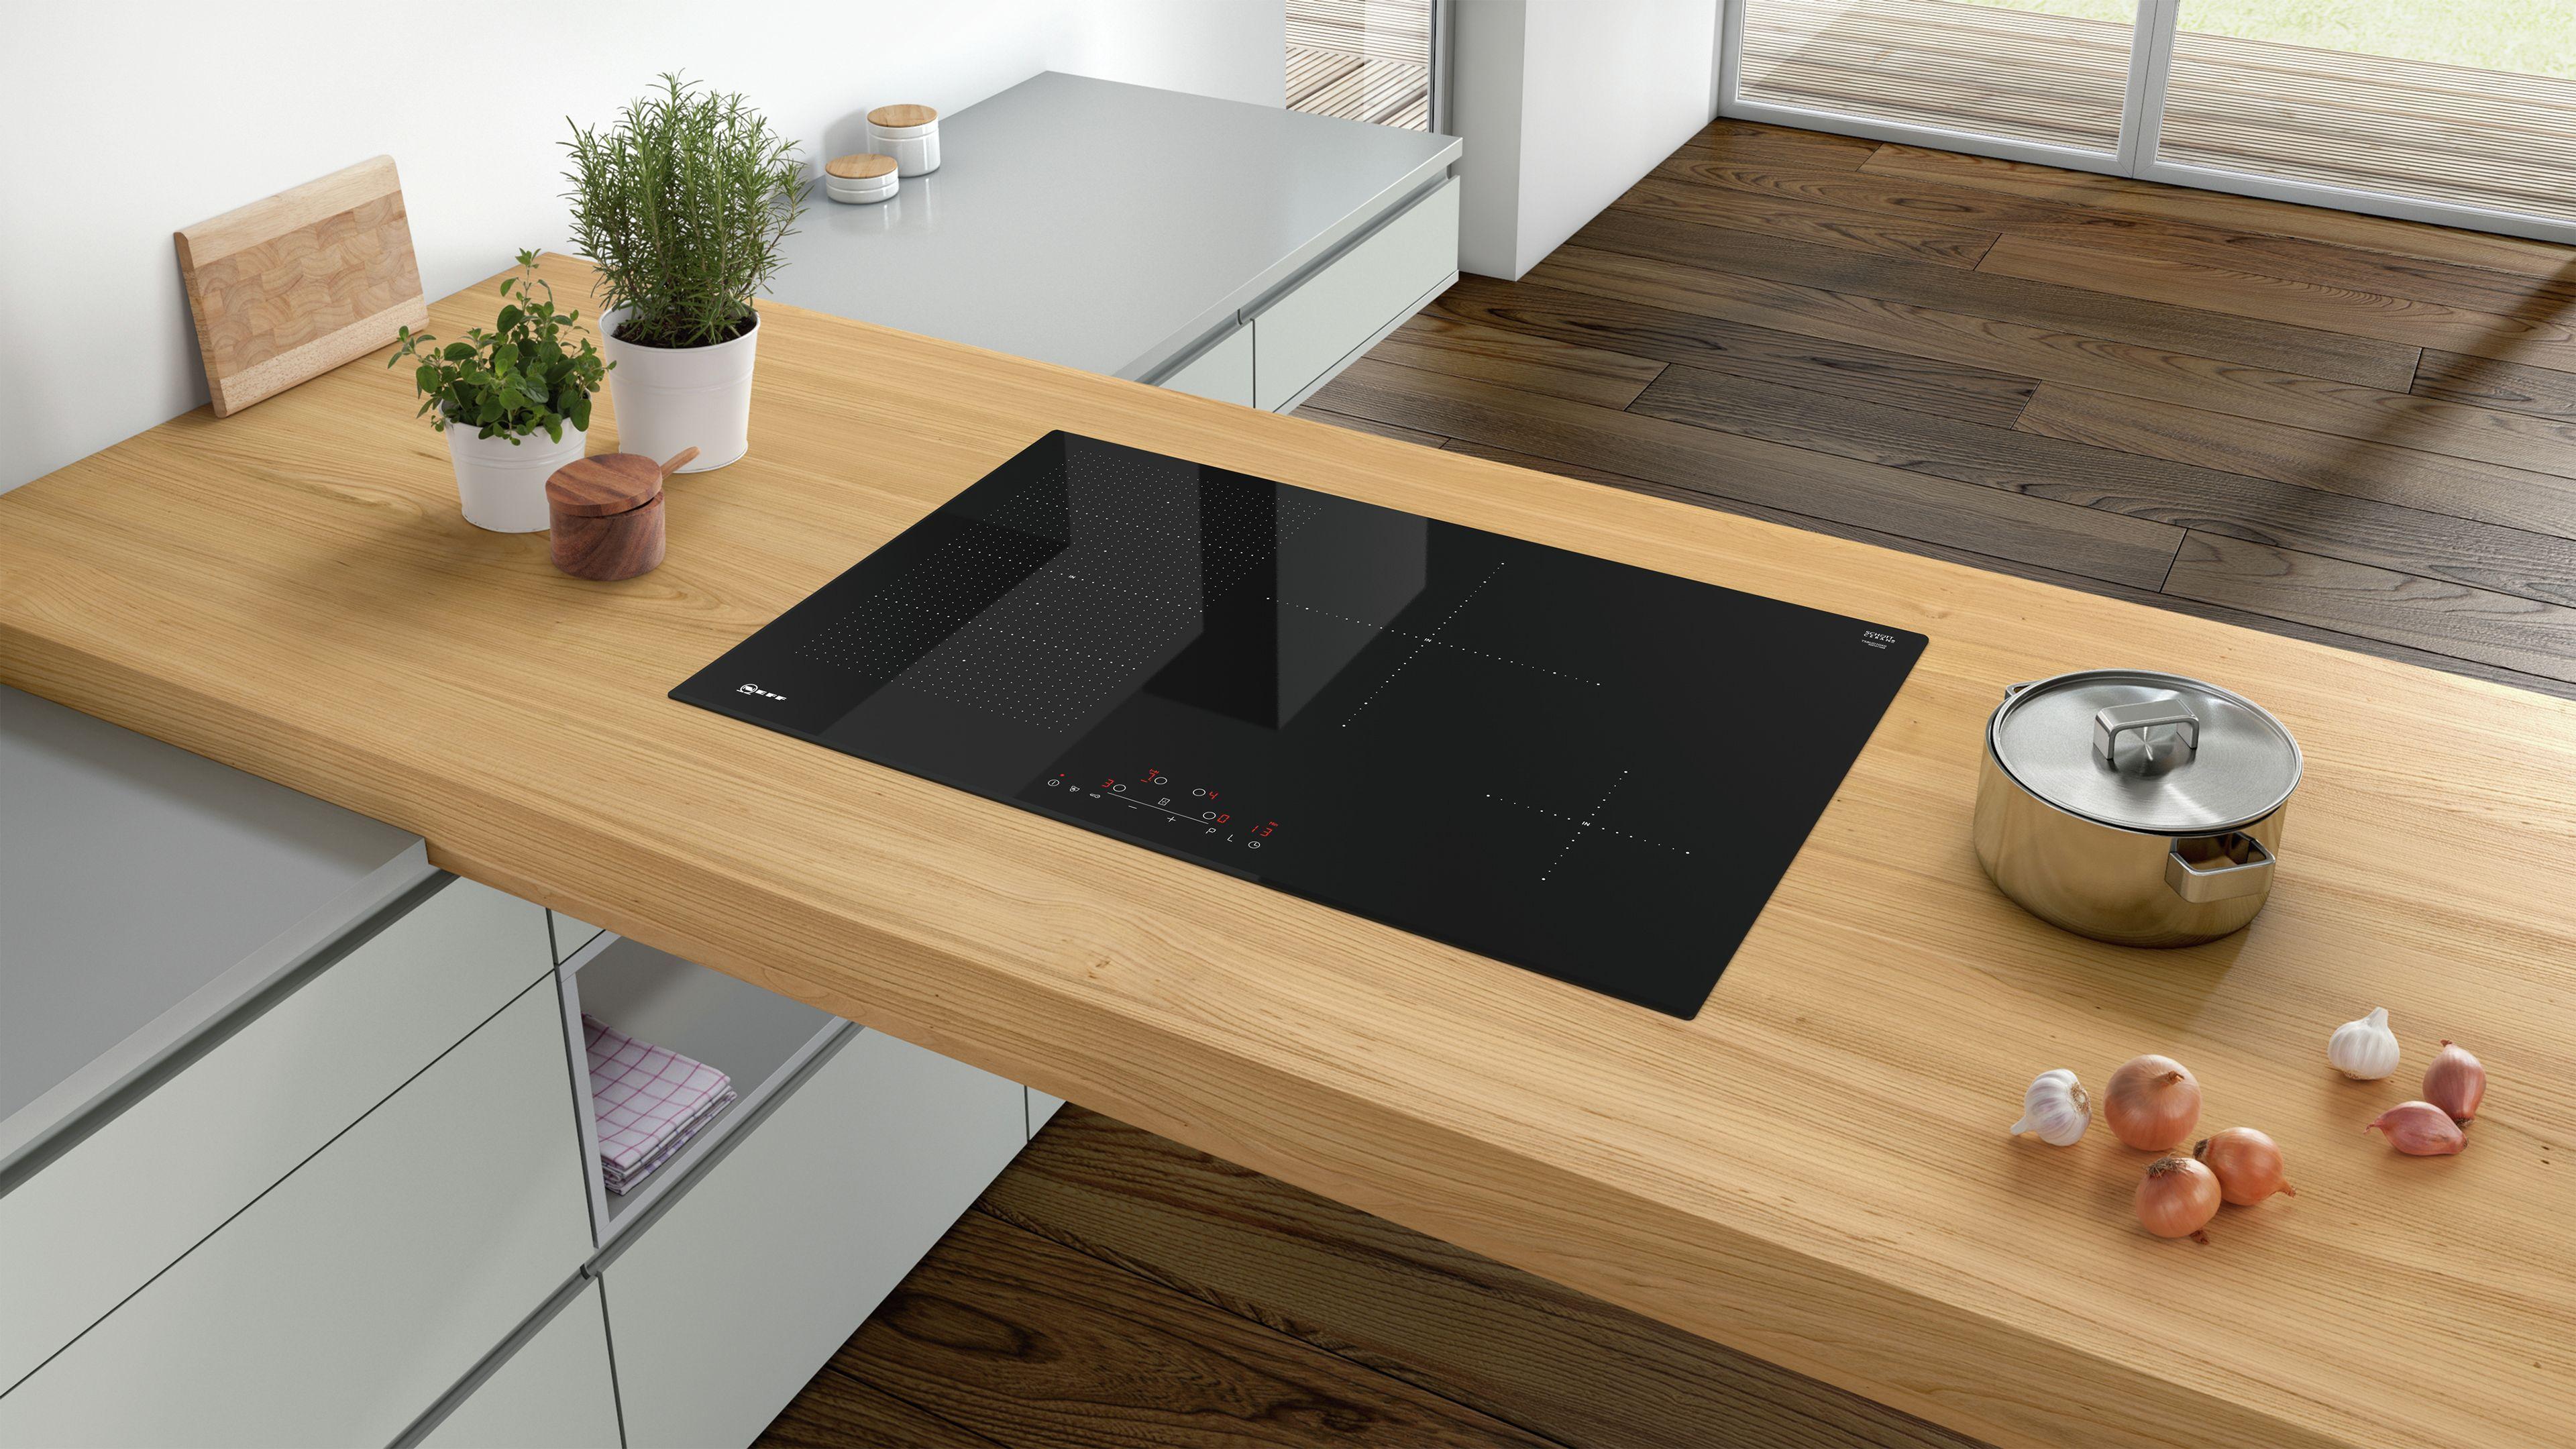 Piano Induzione Neff Flexinduction table induction 80 cm - n 70 - t58ud10x0 | neff | table de